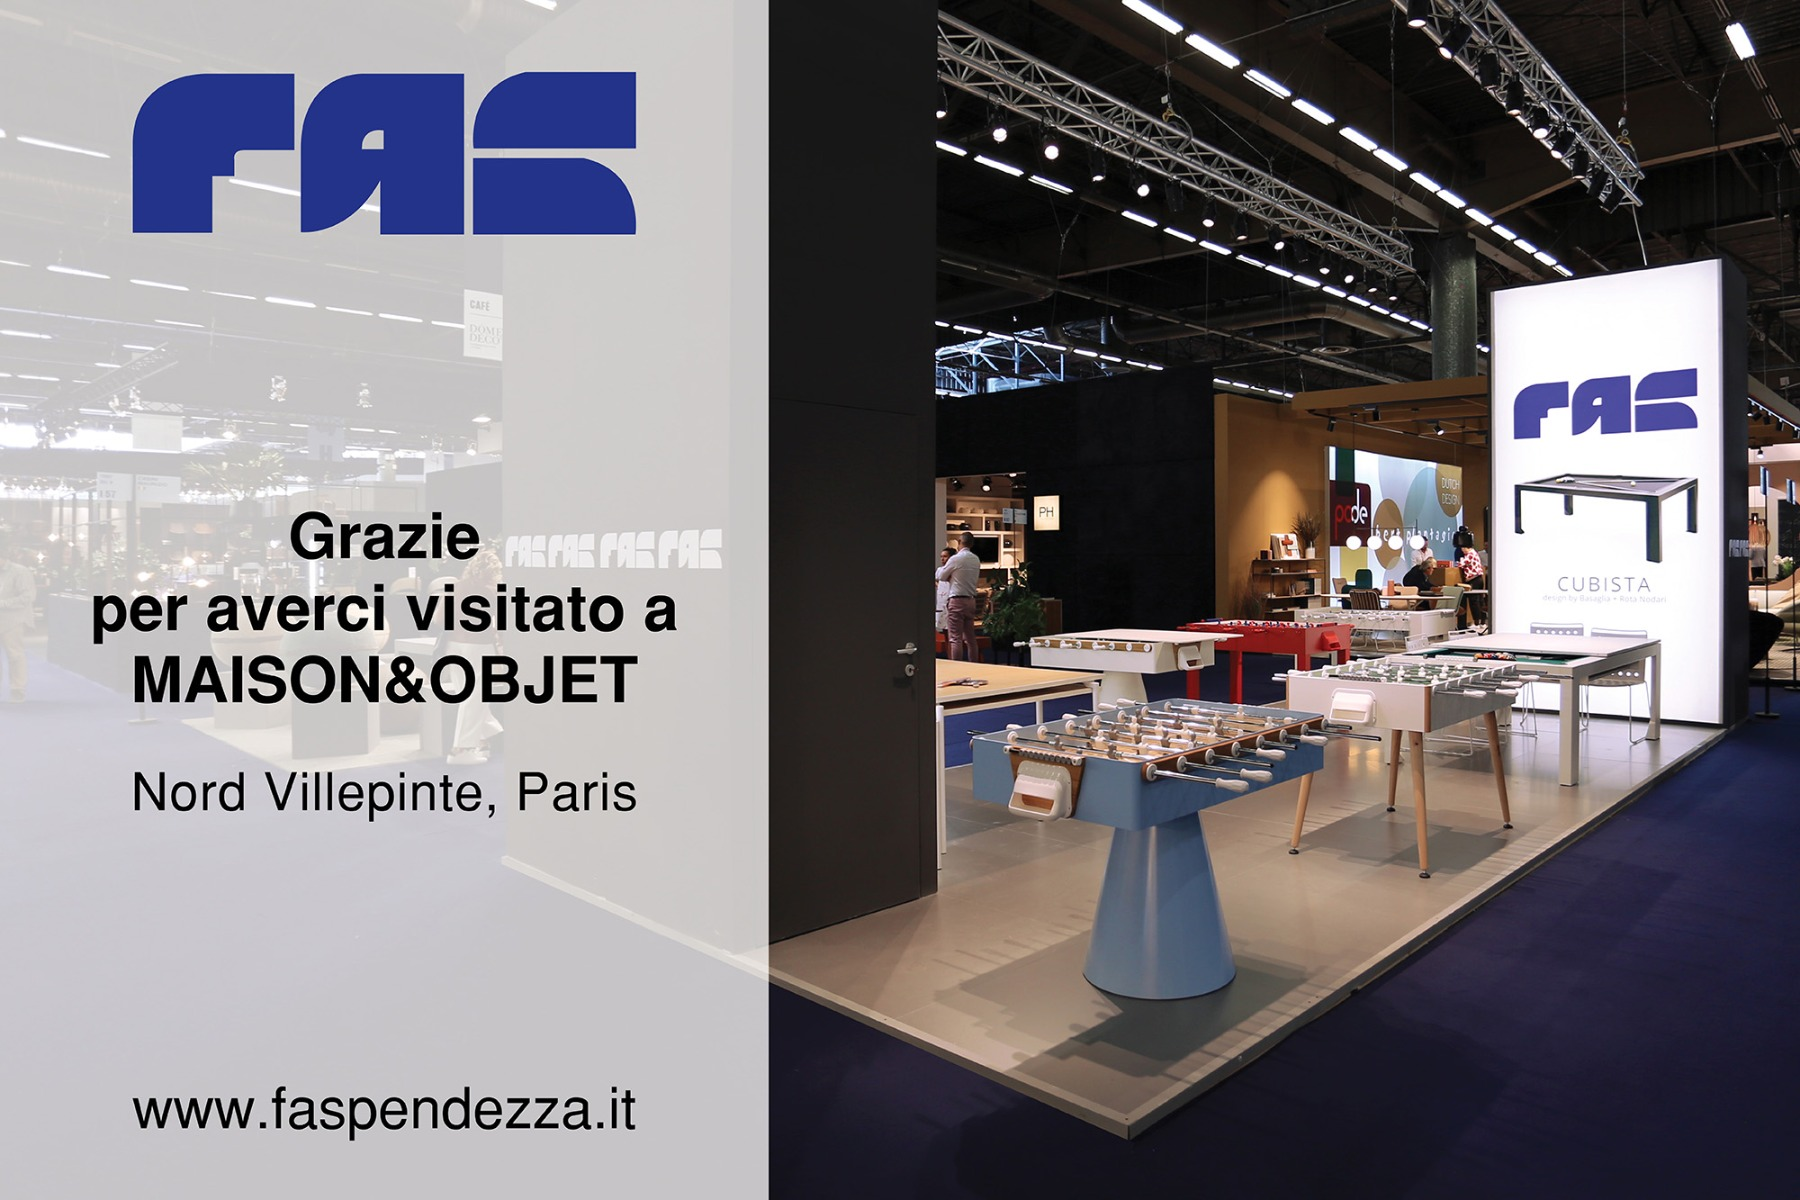 Fas Pendezza @ Maison&Objet - Parigi 2019